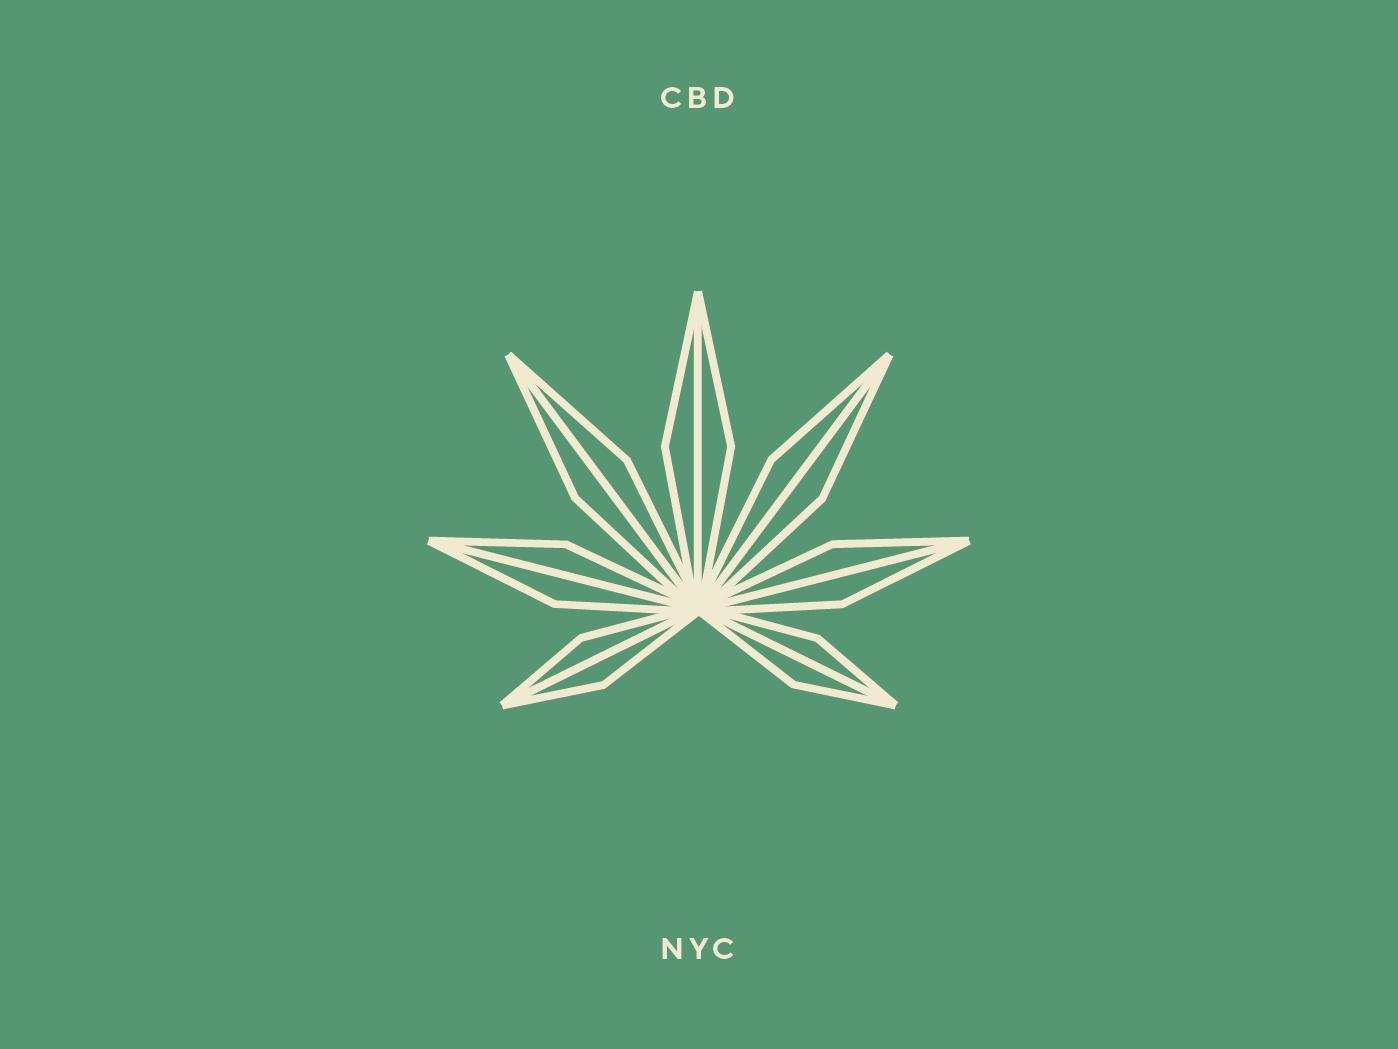 Marijuana leaf logo by Cristie Stevens on Dribbble